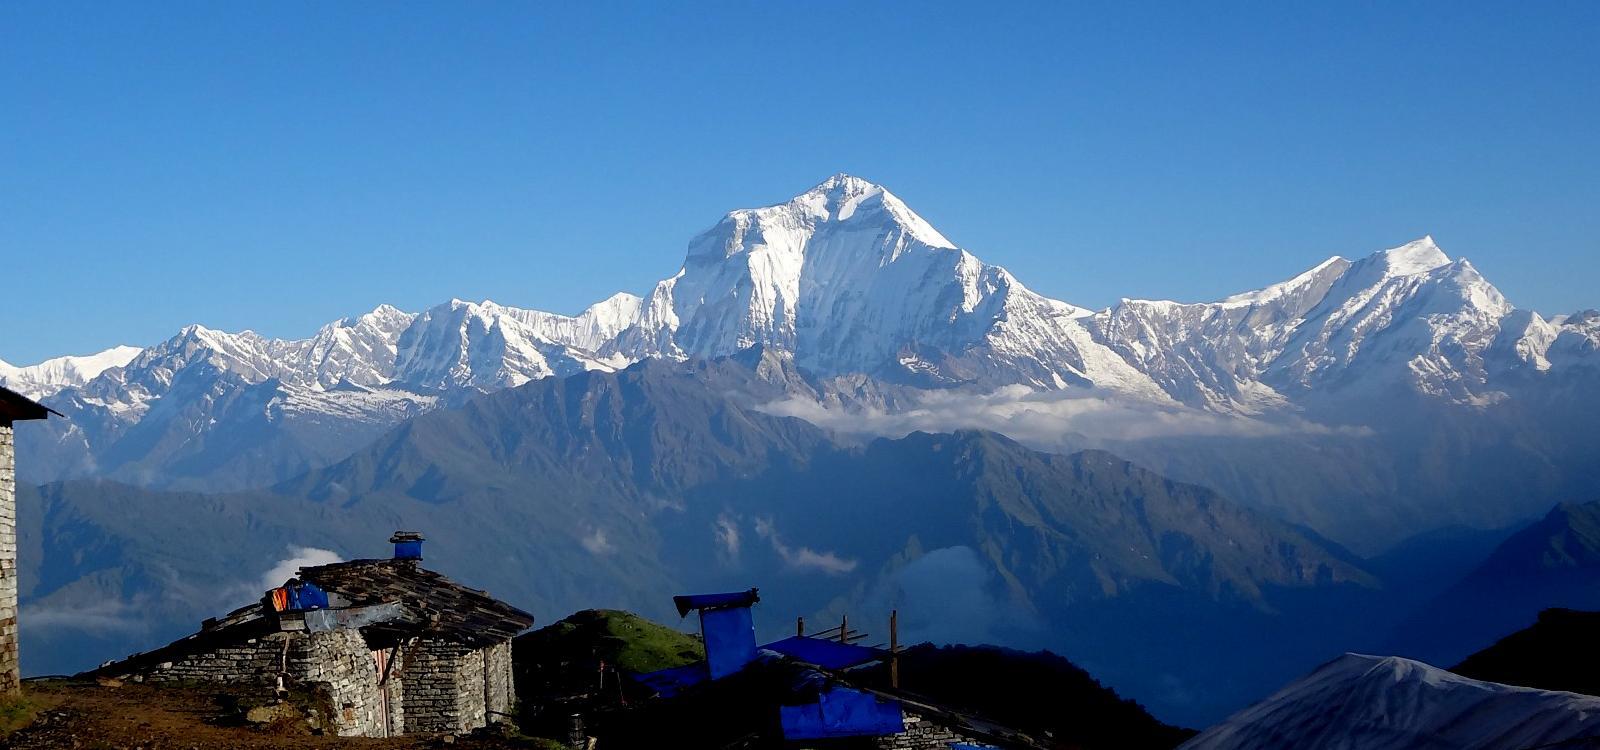 Khopra Ridge Trek of the Annapurna region